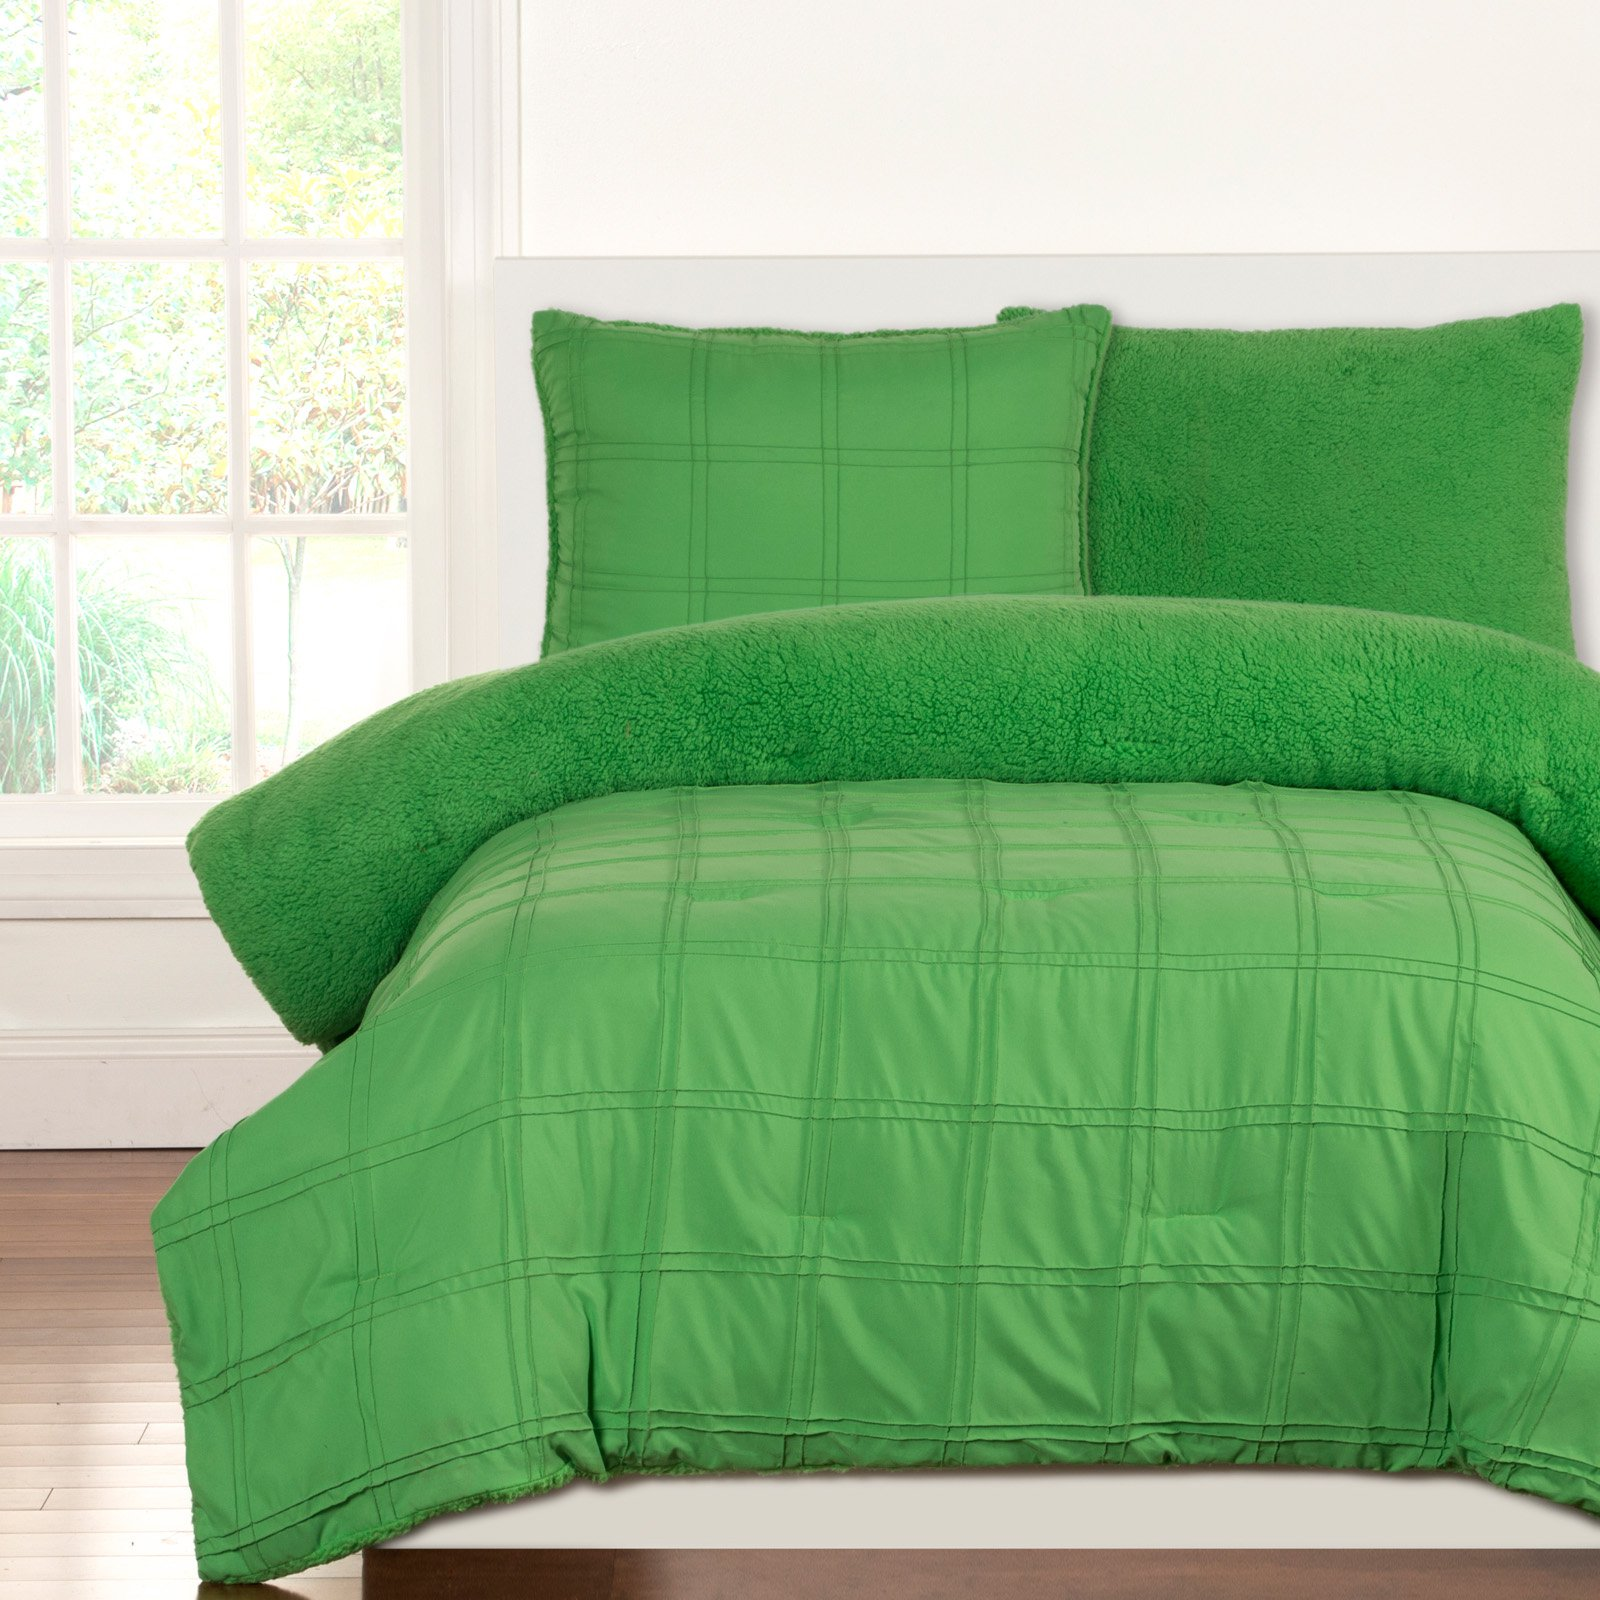 Crayola Playful Plush Jungle GreenFull/Queen Comforter Set